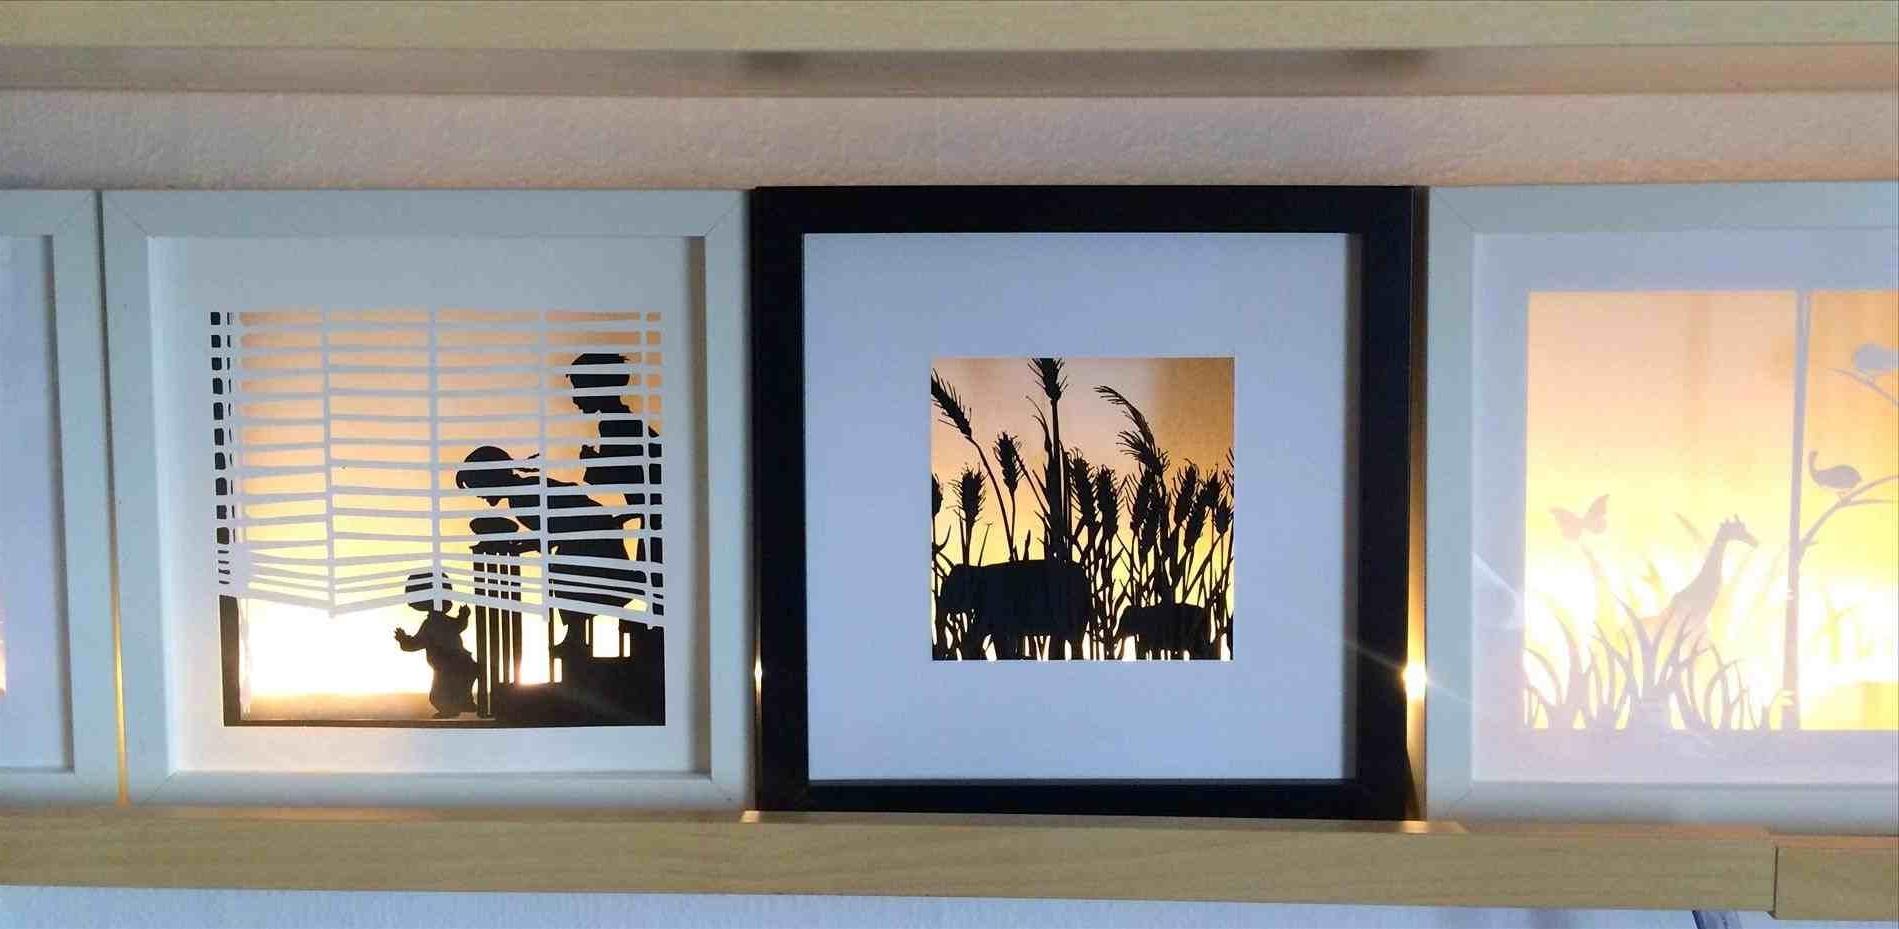 Wall Light Box Art Intended For Favorite Ideas Jeff Glossary Tate Jeff Wall Light Box Art (View 14 of 15)